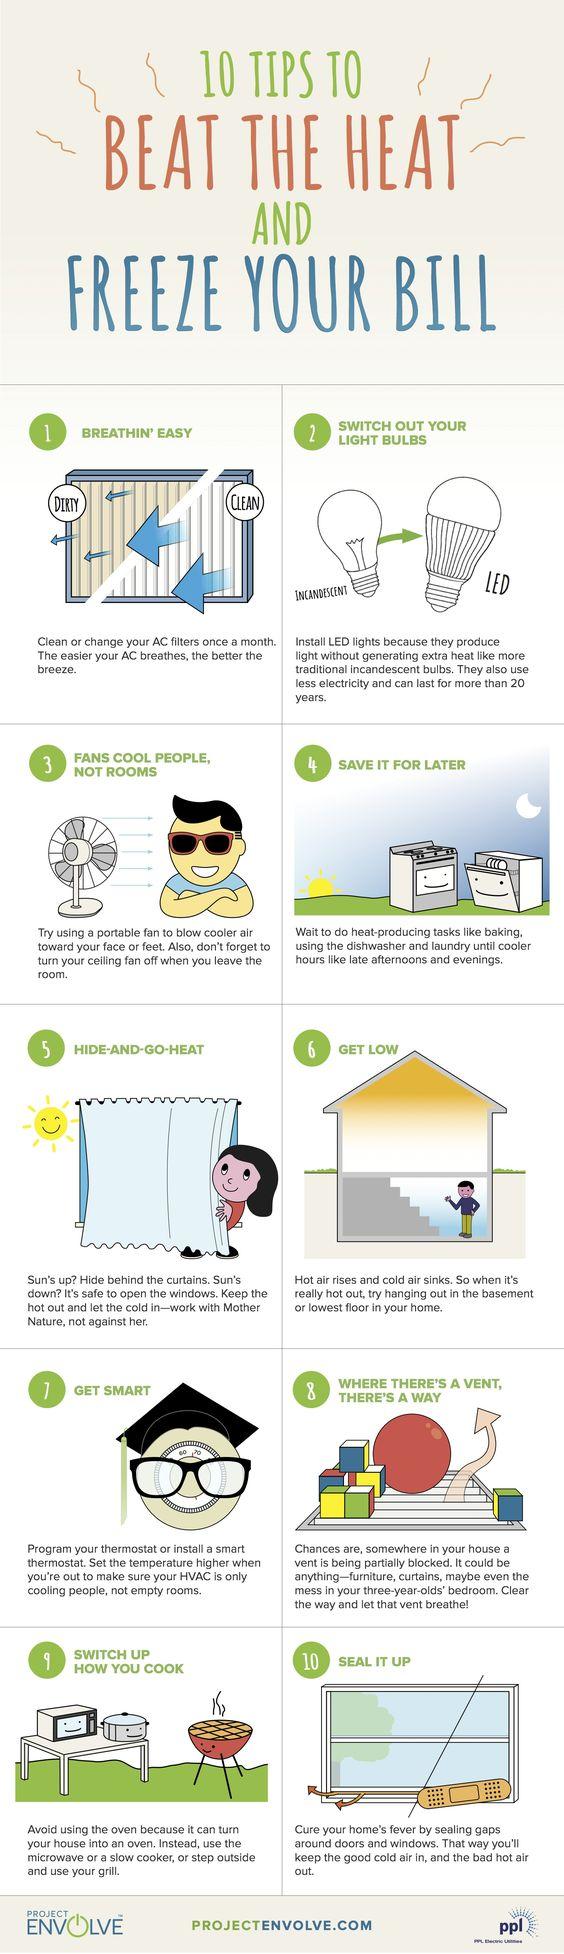 10 Summer Energy Savings Tips  #ProjectEnvolve #ad